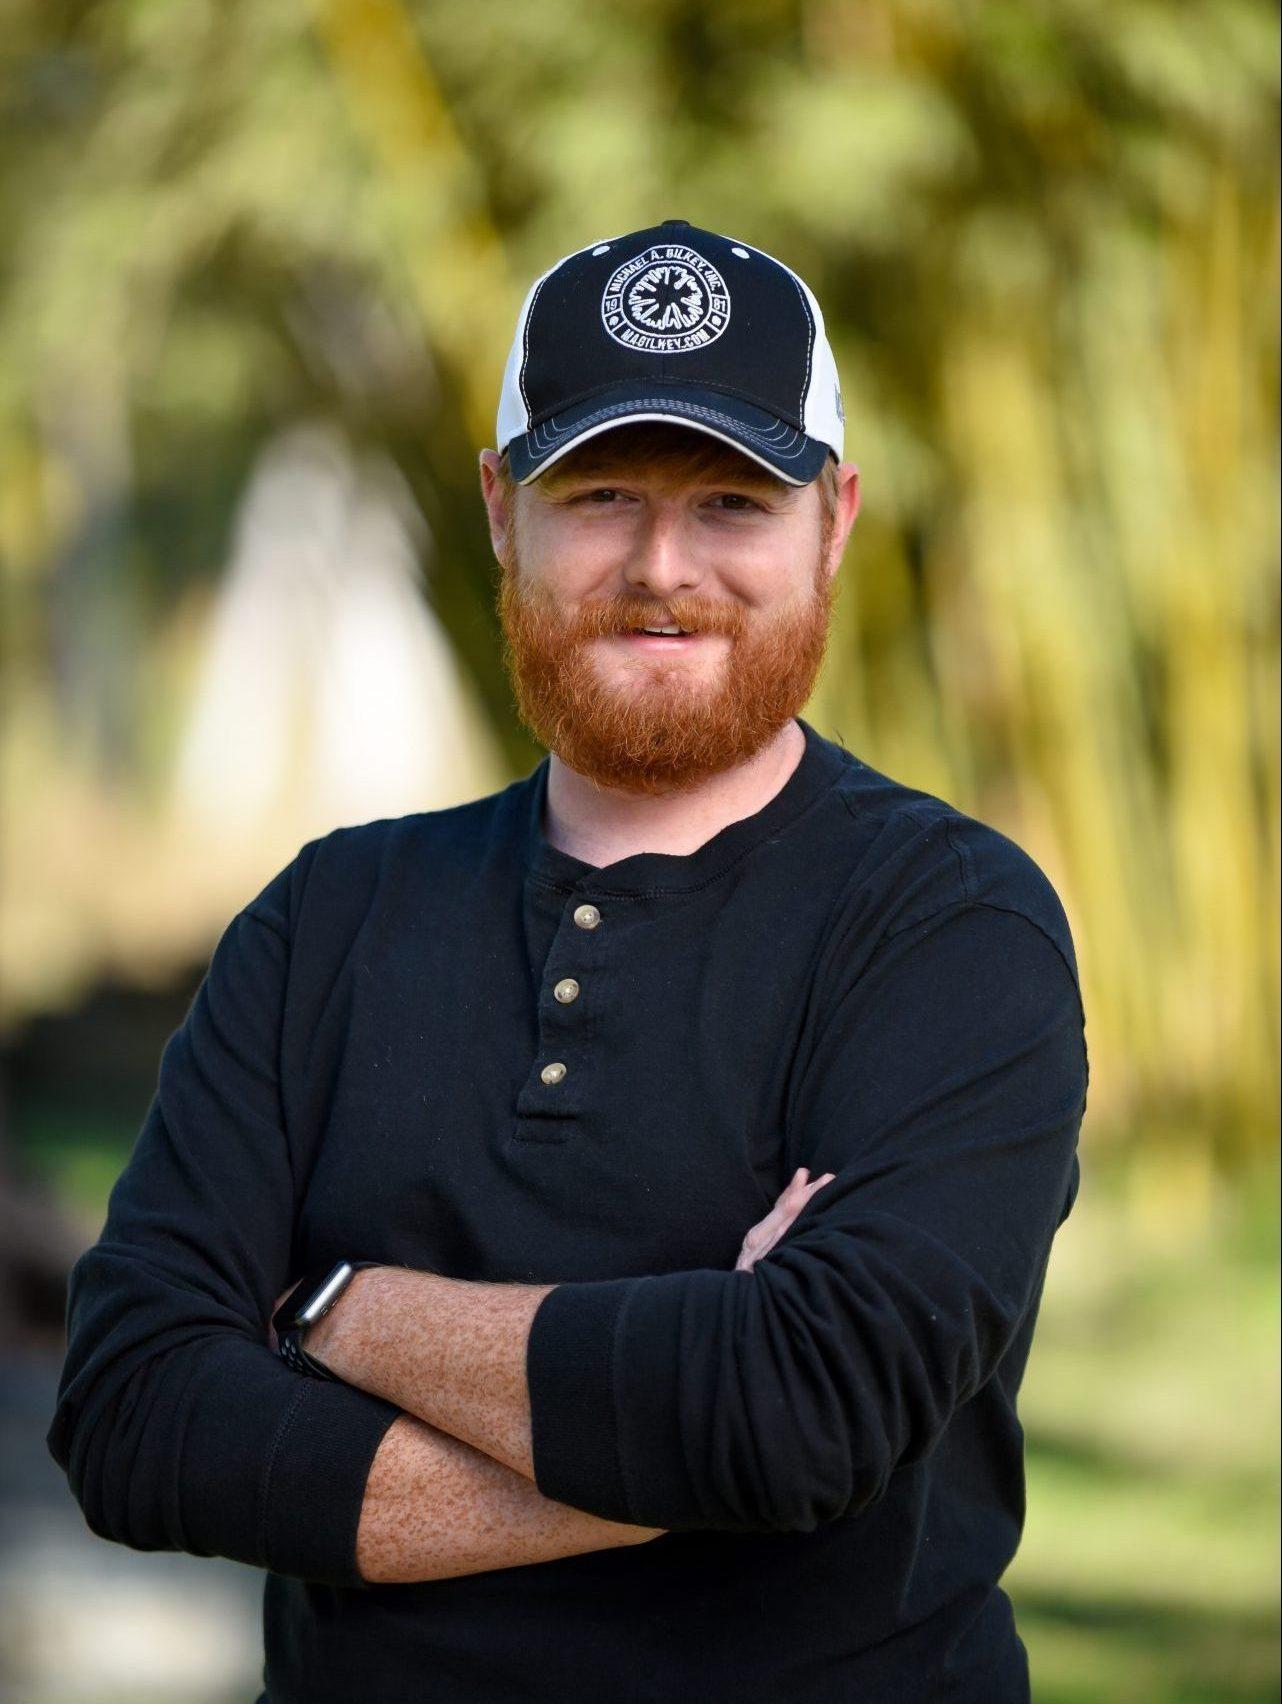 Ryan Hynko